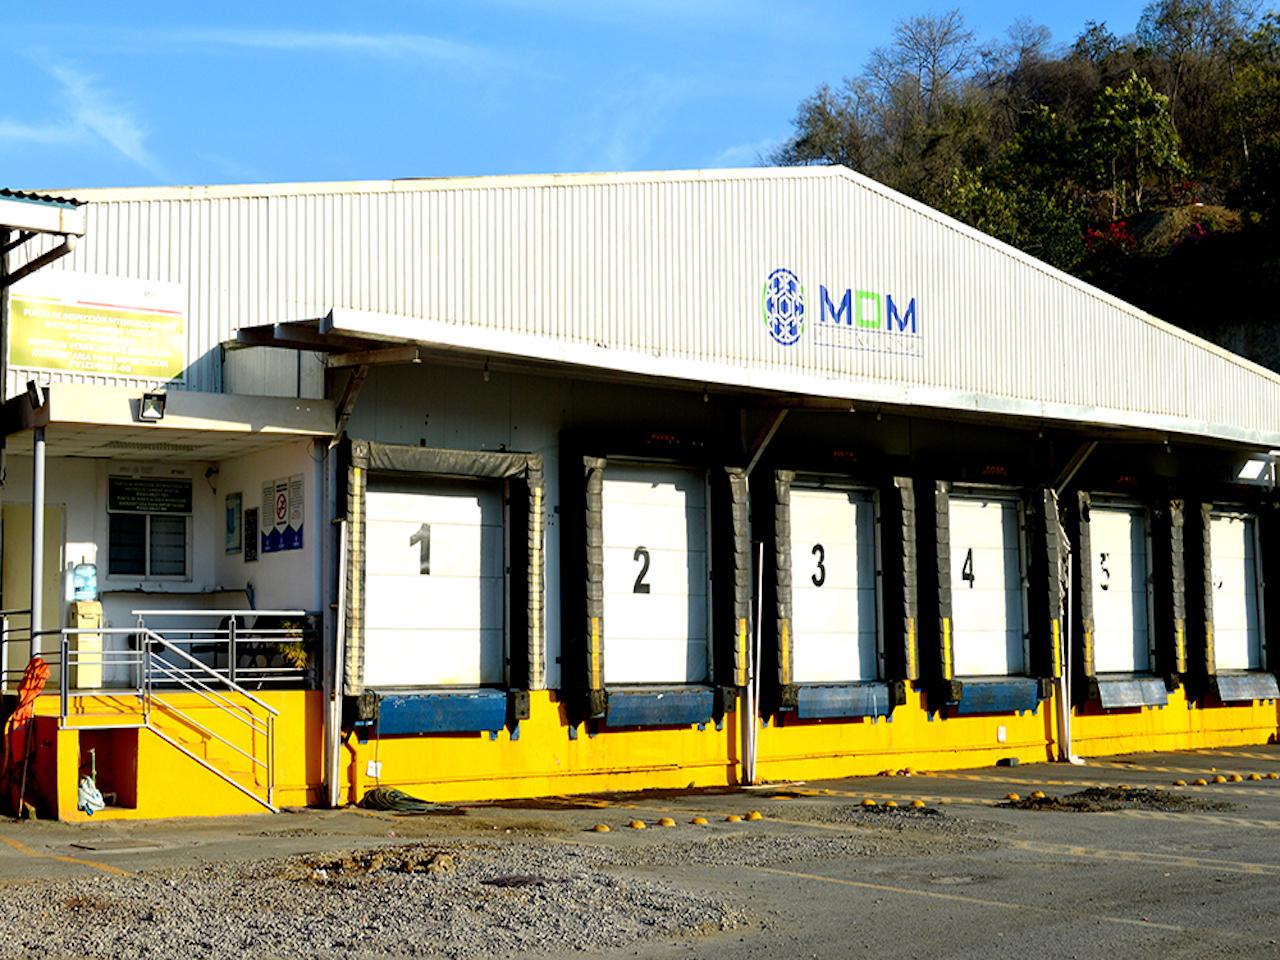 MDM INTERNACTIONAL SERVICE S.A. DE C.V. MOVIMIENTO DE PERSONAL